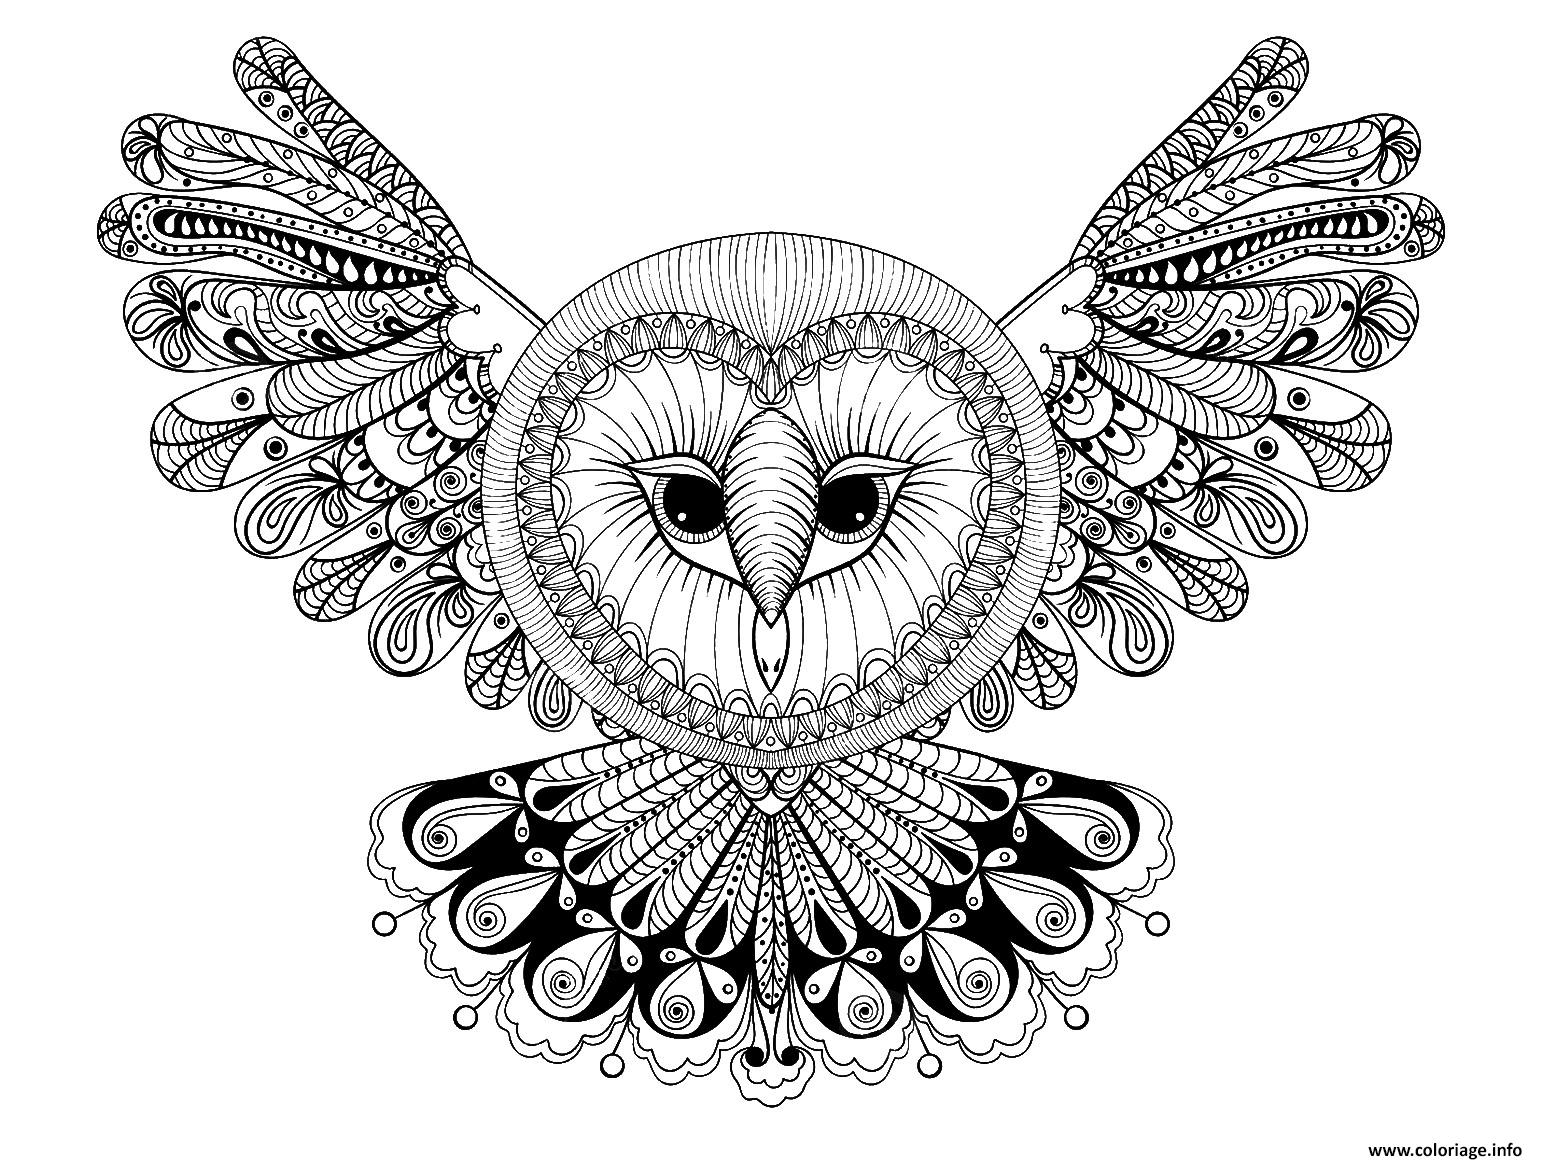 Coloriage hibou avec grande tete forme mandala adulte animaux dessin - Dessins de mandala ...